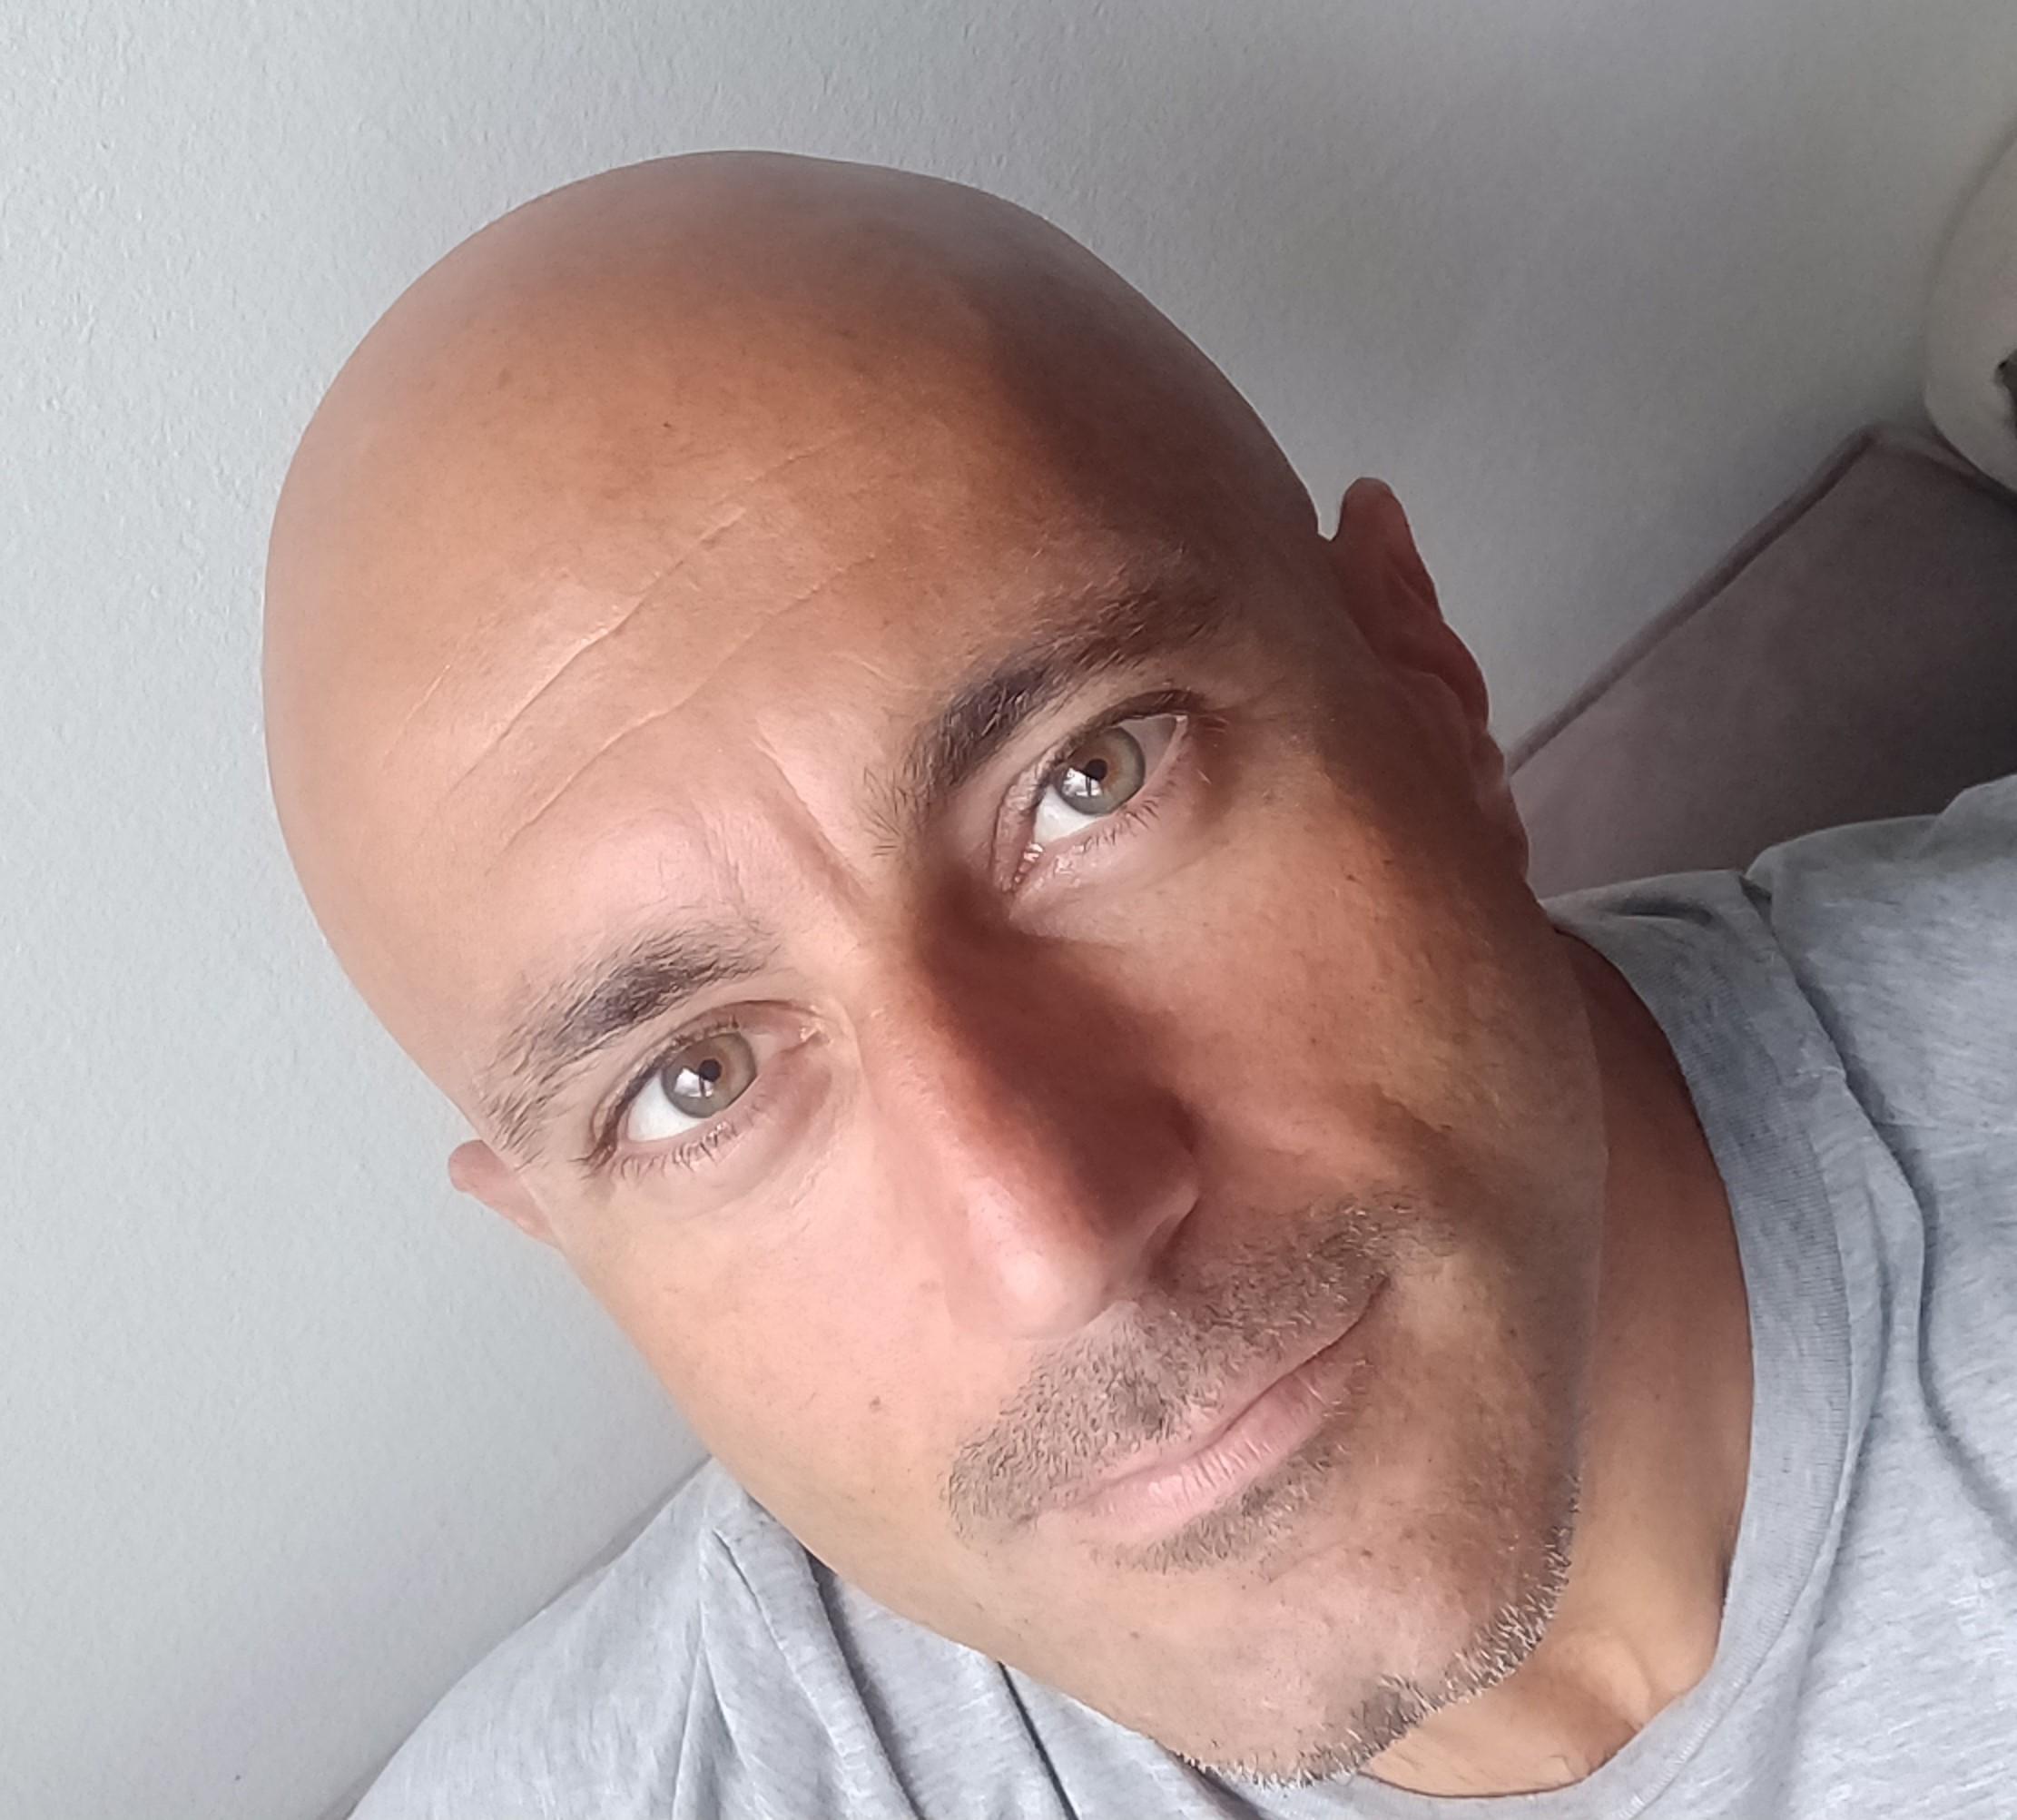 Alessandro Lavanna